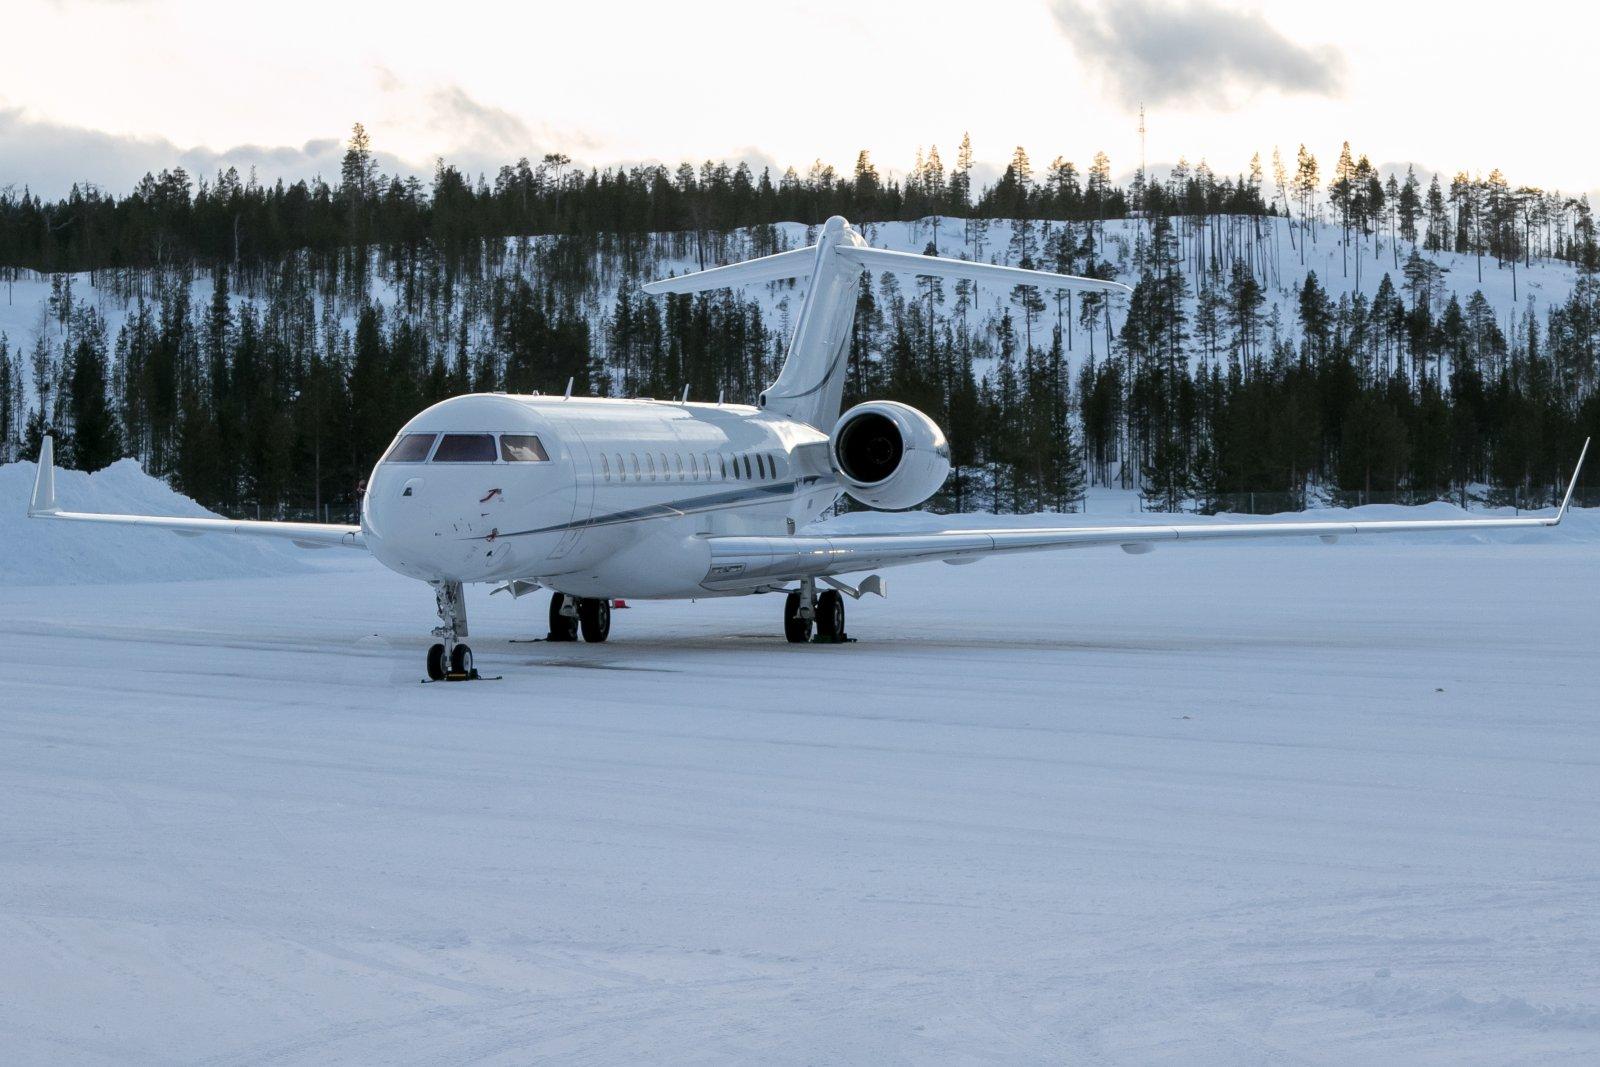 N302AK. Bombardier Global 6000. 22.2.2020. Teterborosta Ivaloon.